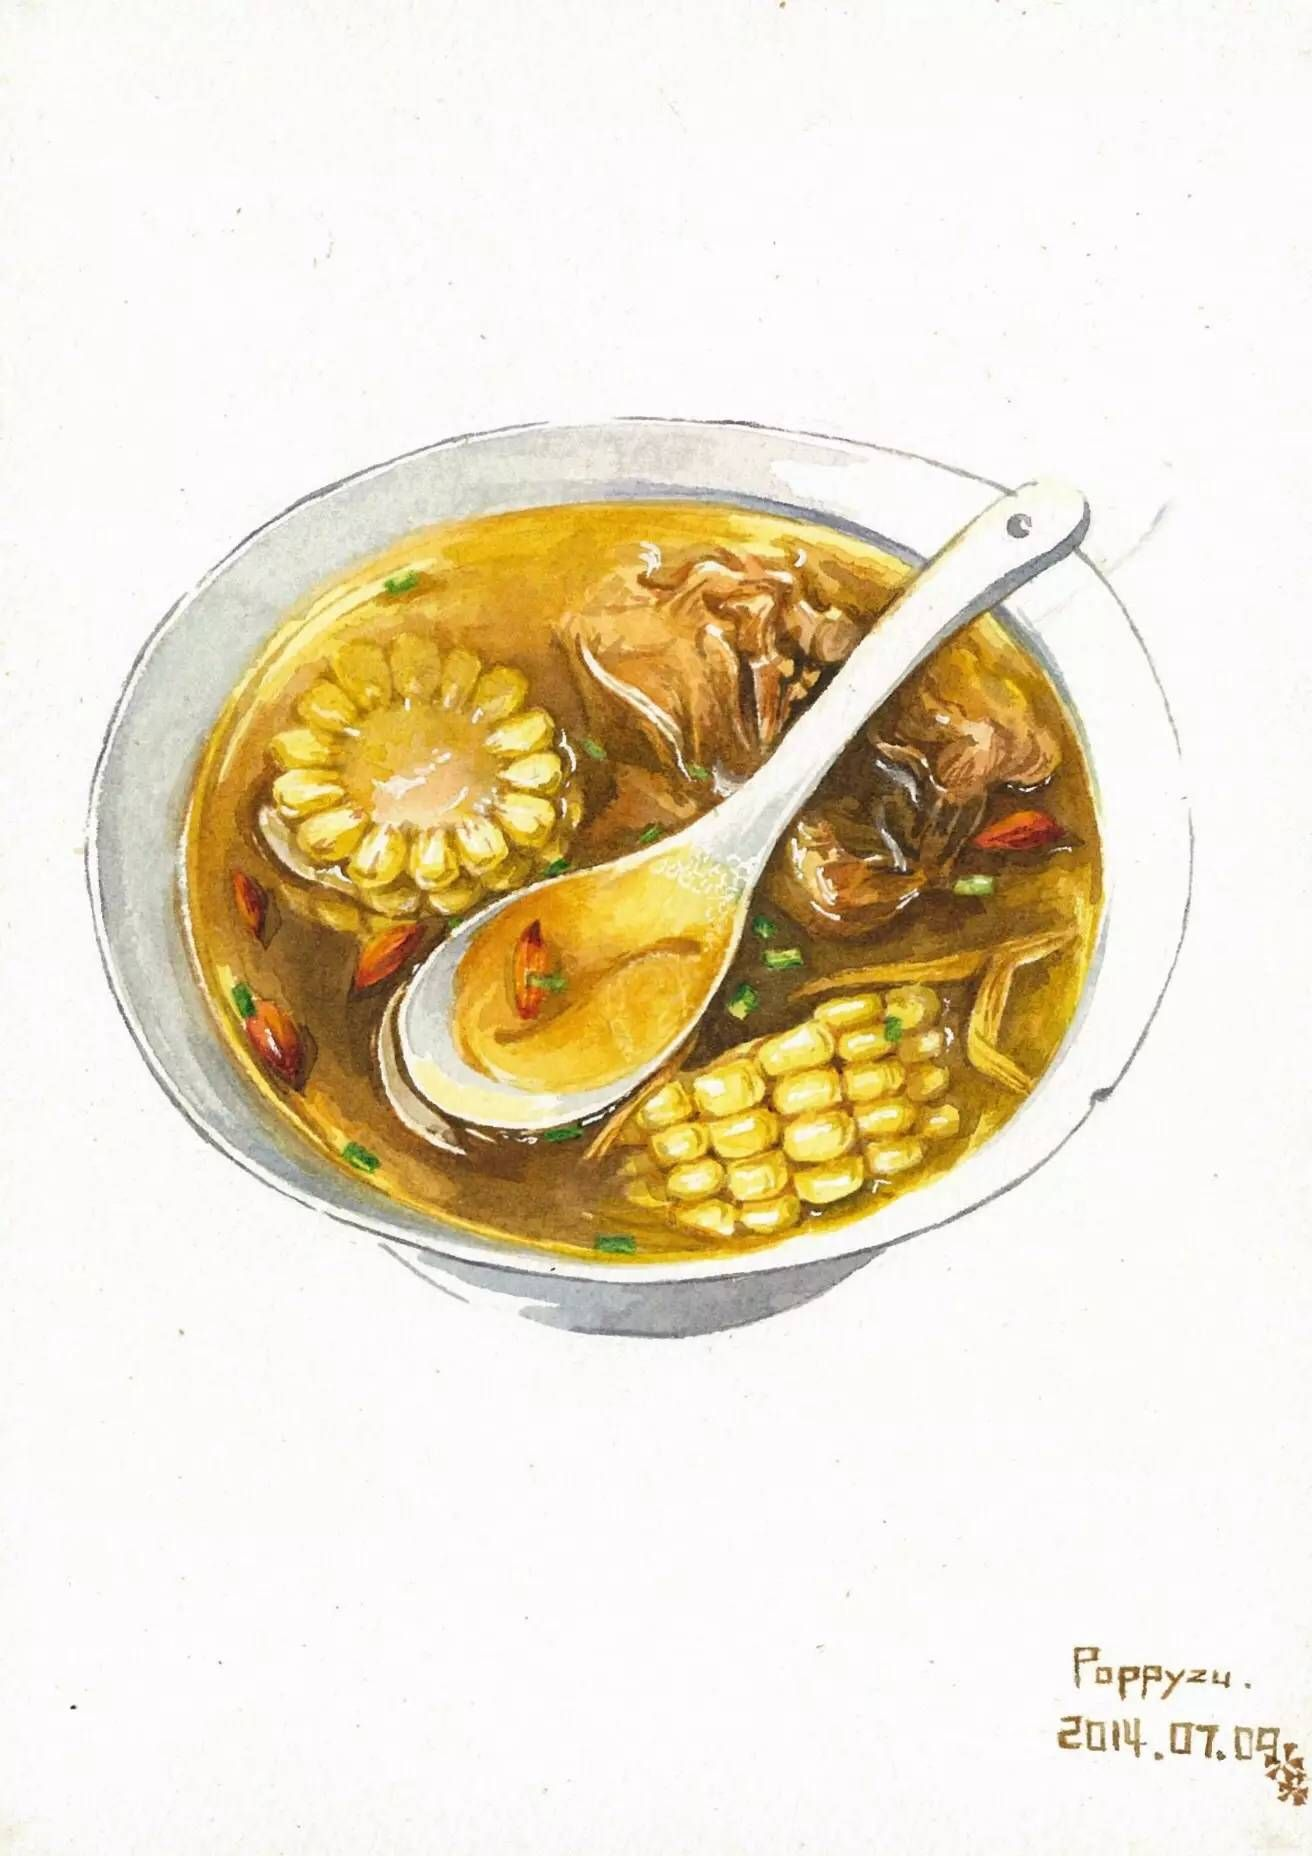 Food Art Sayur Asam Sayurasem Food Traditionalfood Indonesianfood Indonesian Food Vegan Seni Makanan Makanan Dan Minuman Makanan Indonesia